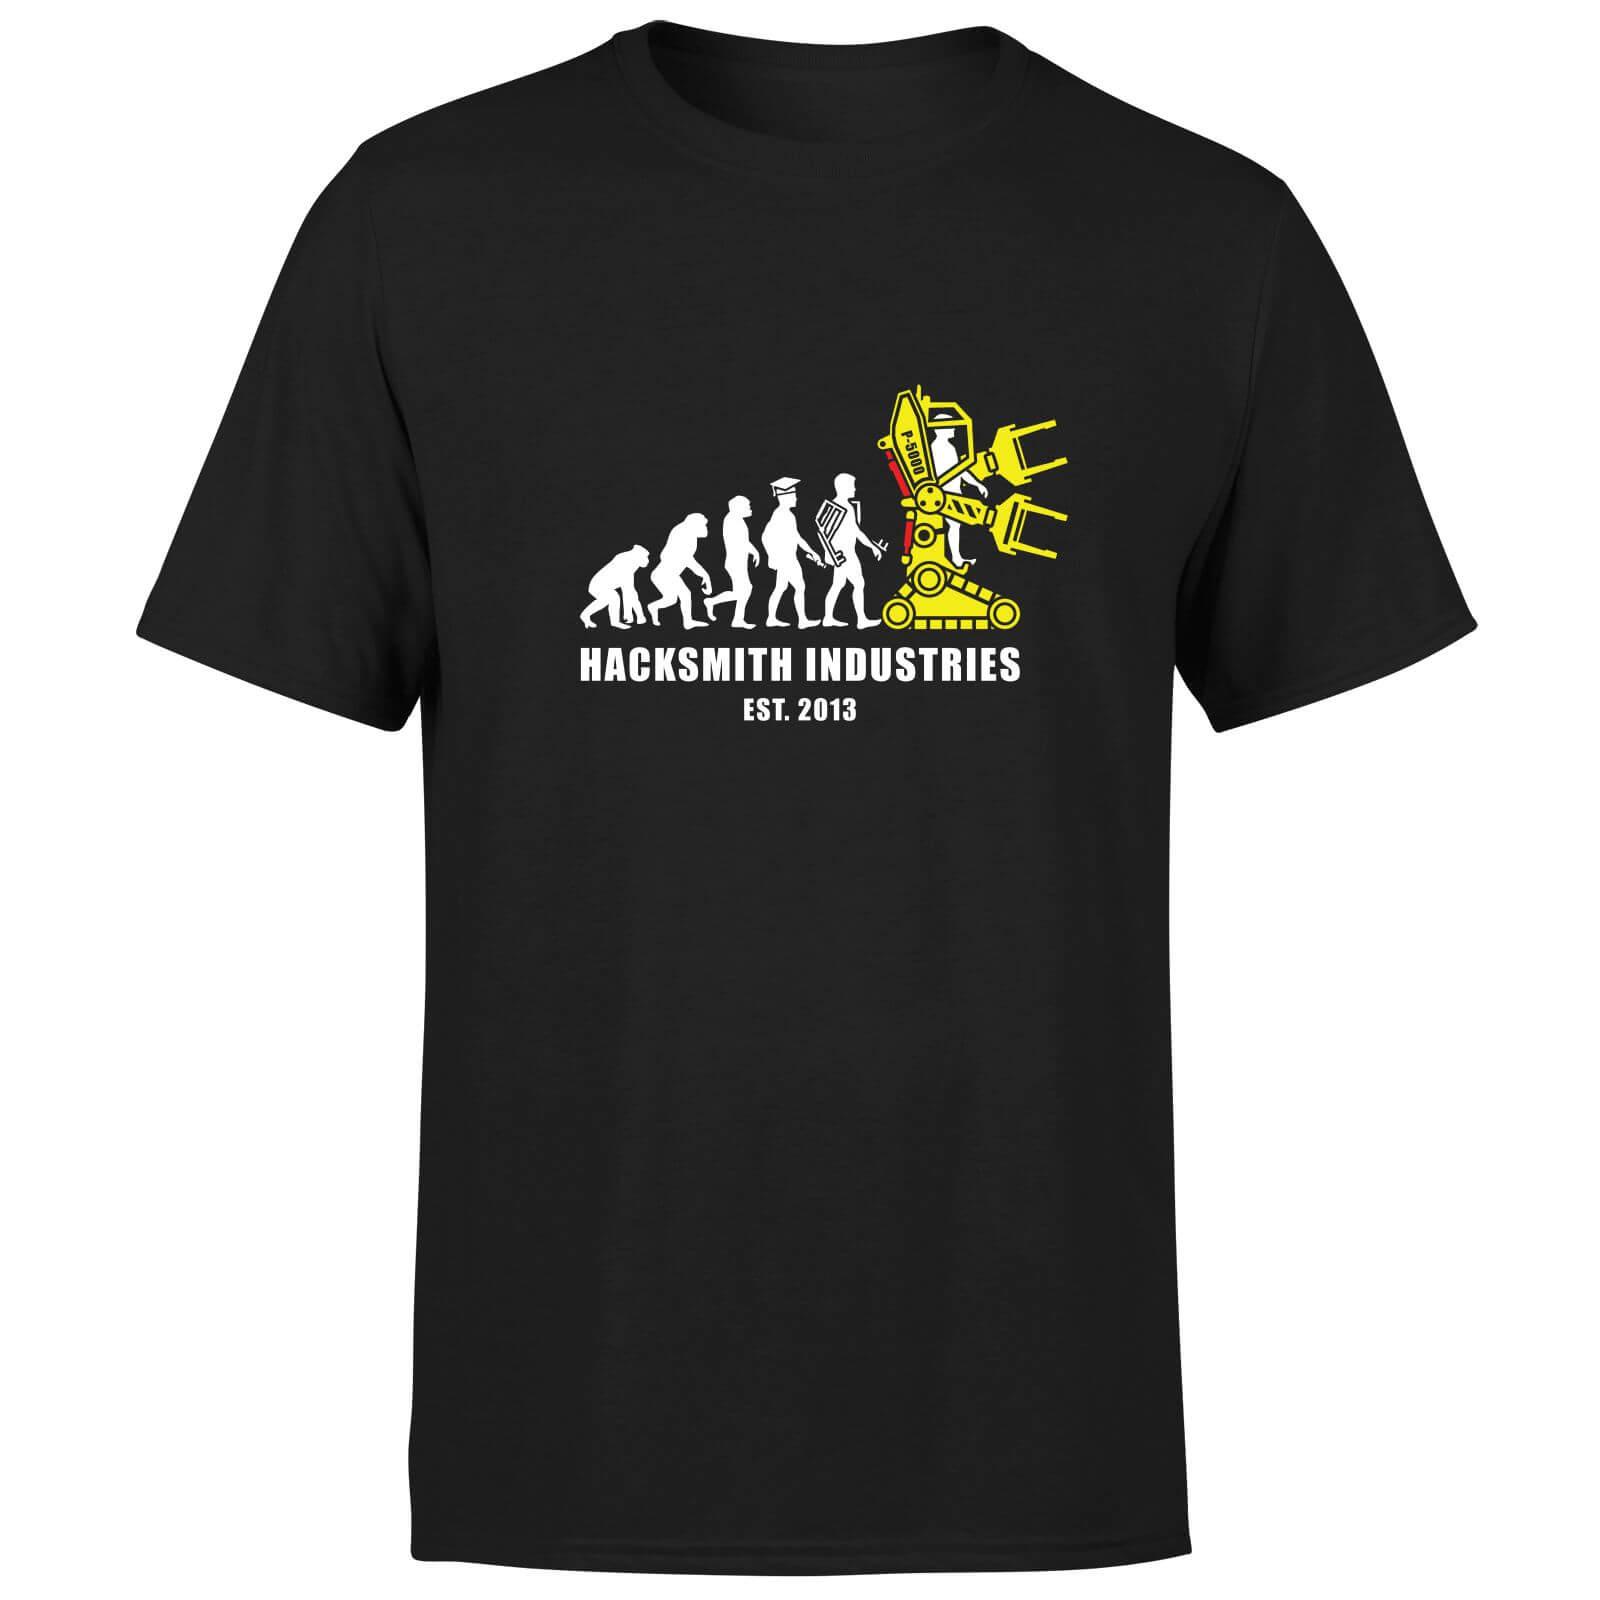 Hacksmith Industries EST. 2013 T-Shirt - Black - L - Black